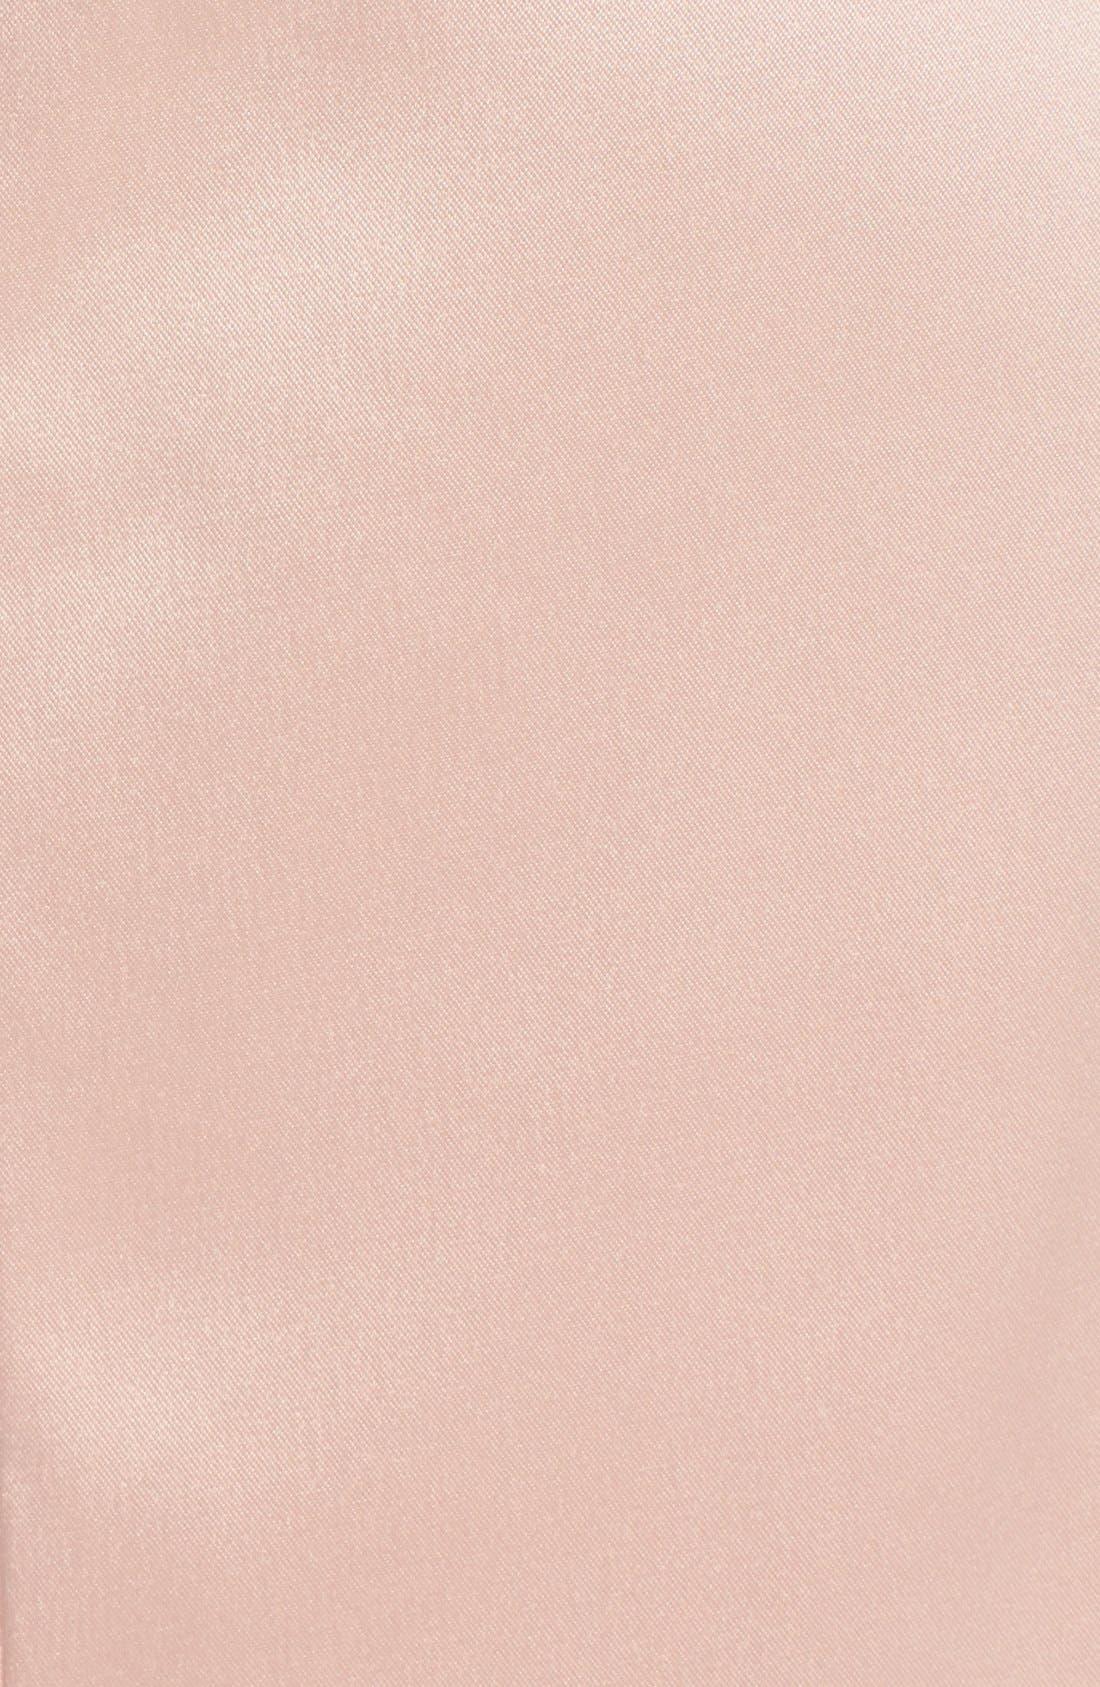 Alternate Image 3  - Vince Camuto Rhinestone Embellished Stretch Satin Sheath Dress